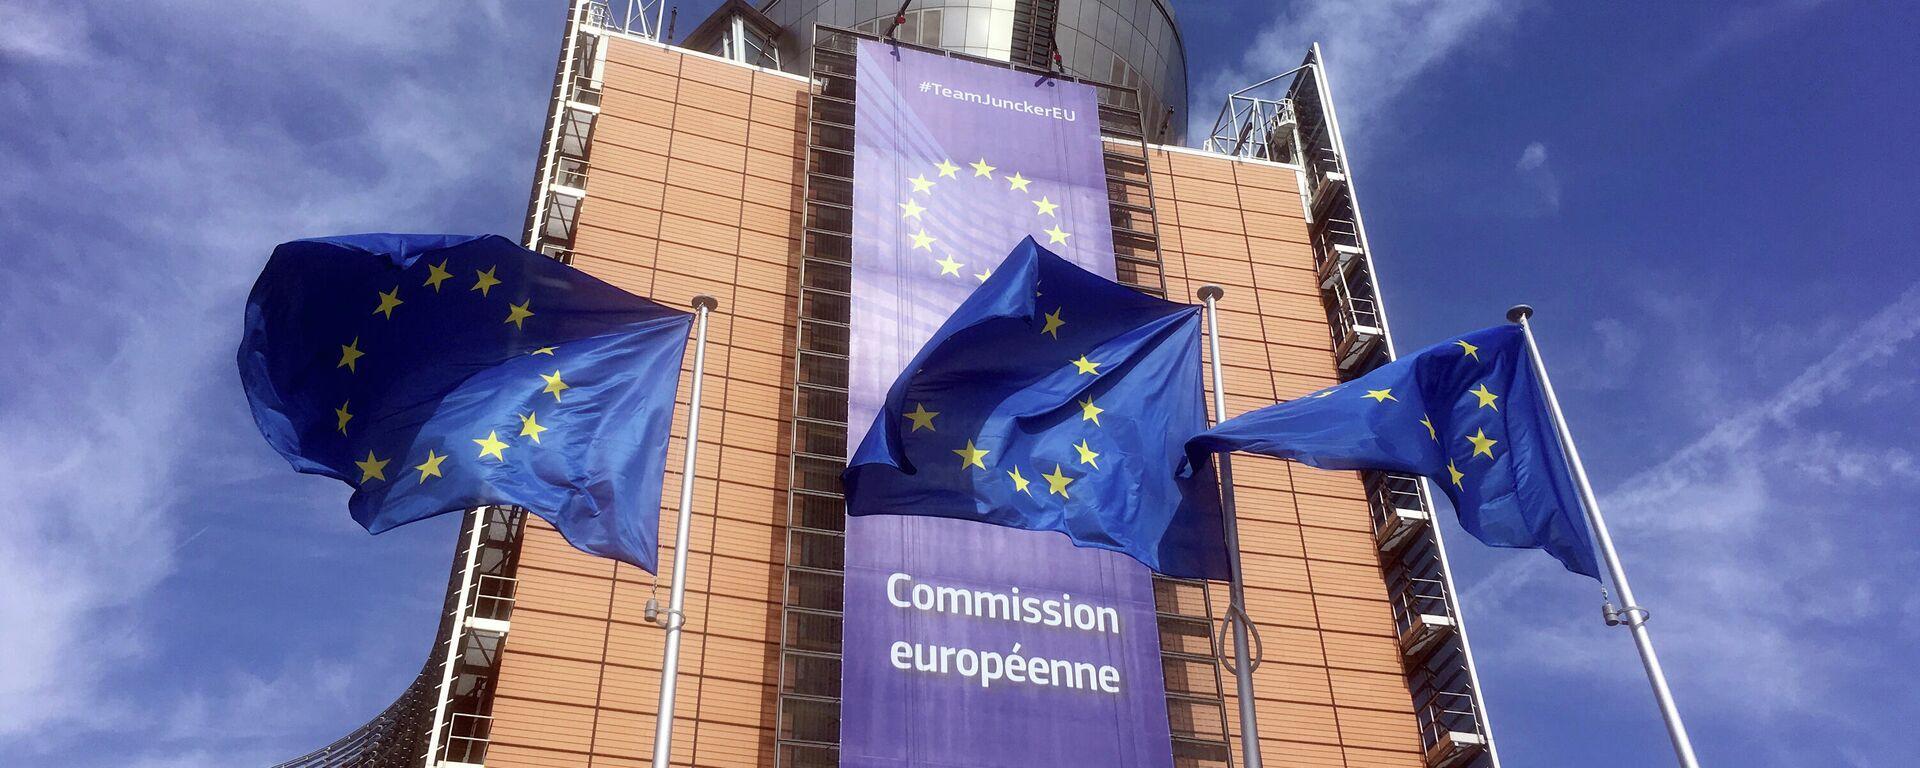 Штаб-квартира Евросоюза в Брюсселе - Sputnik Узбекистан, 1920, 25.06.2021